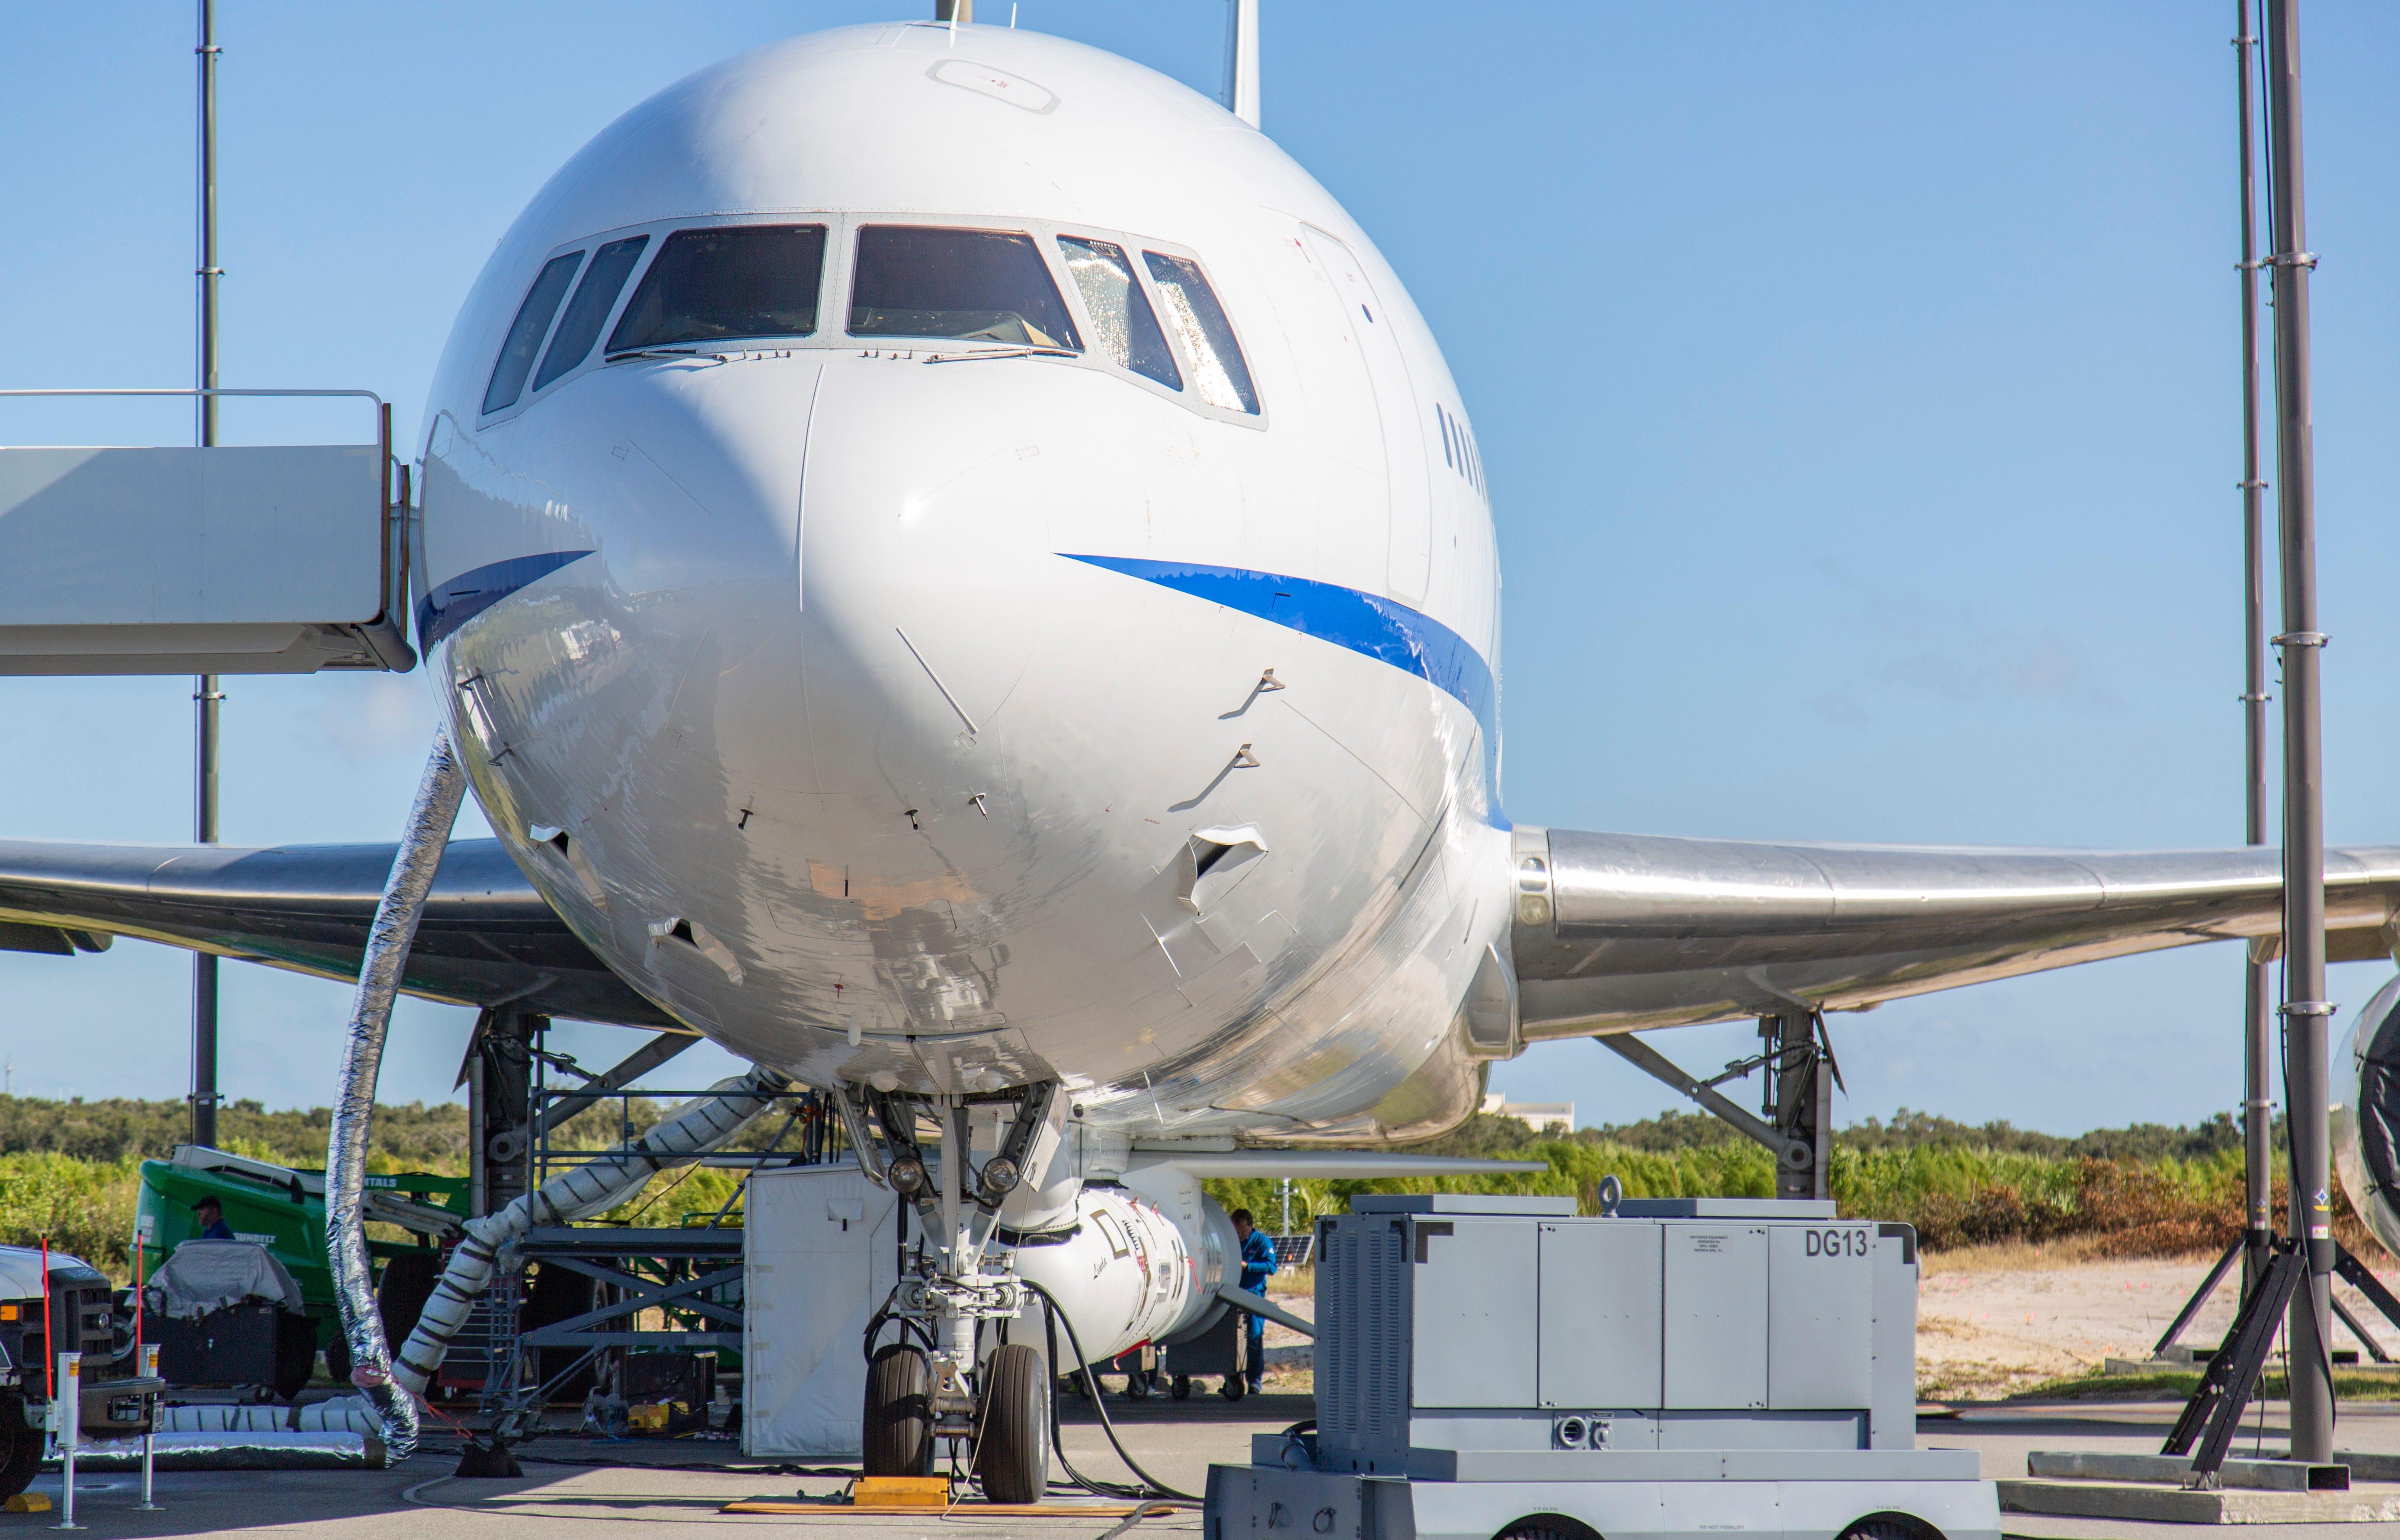 5027f294-abba-407e-8795-cdcf685e28fe-L1011-3 Updates: Pegasus XL launch scrubbed due to technical issues